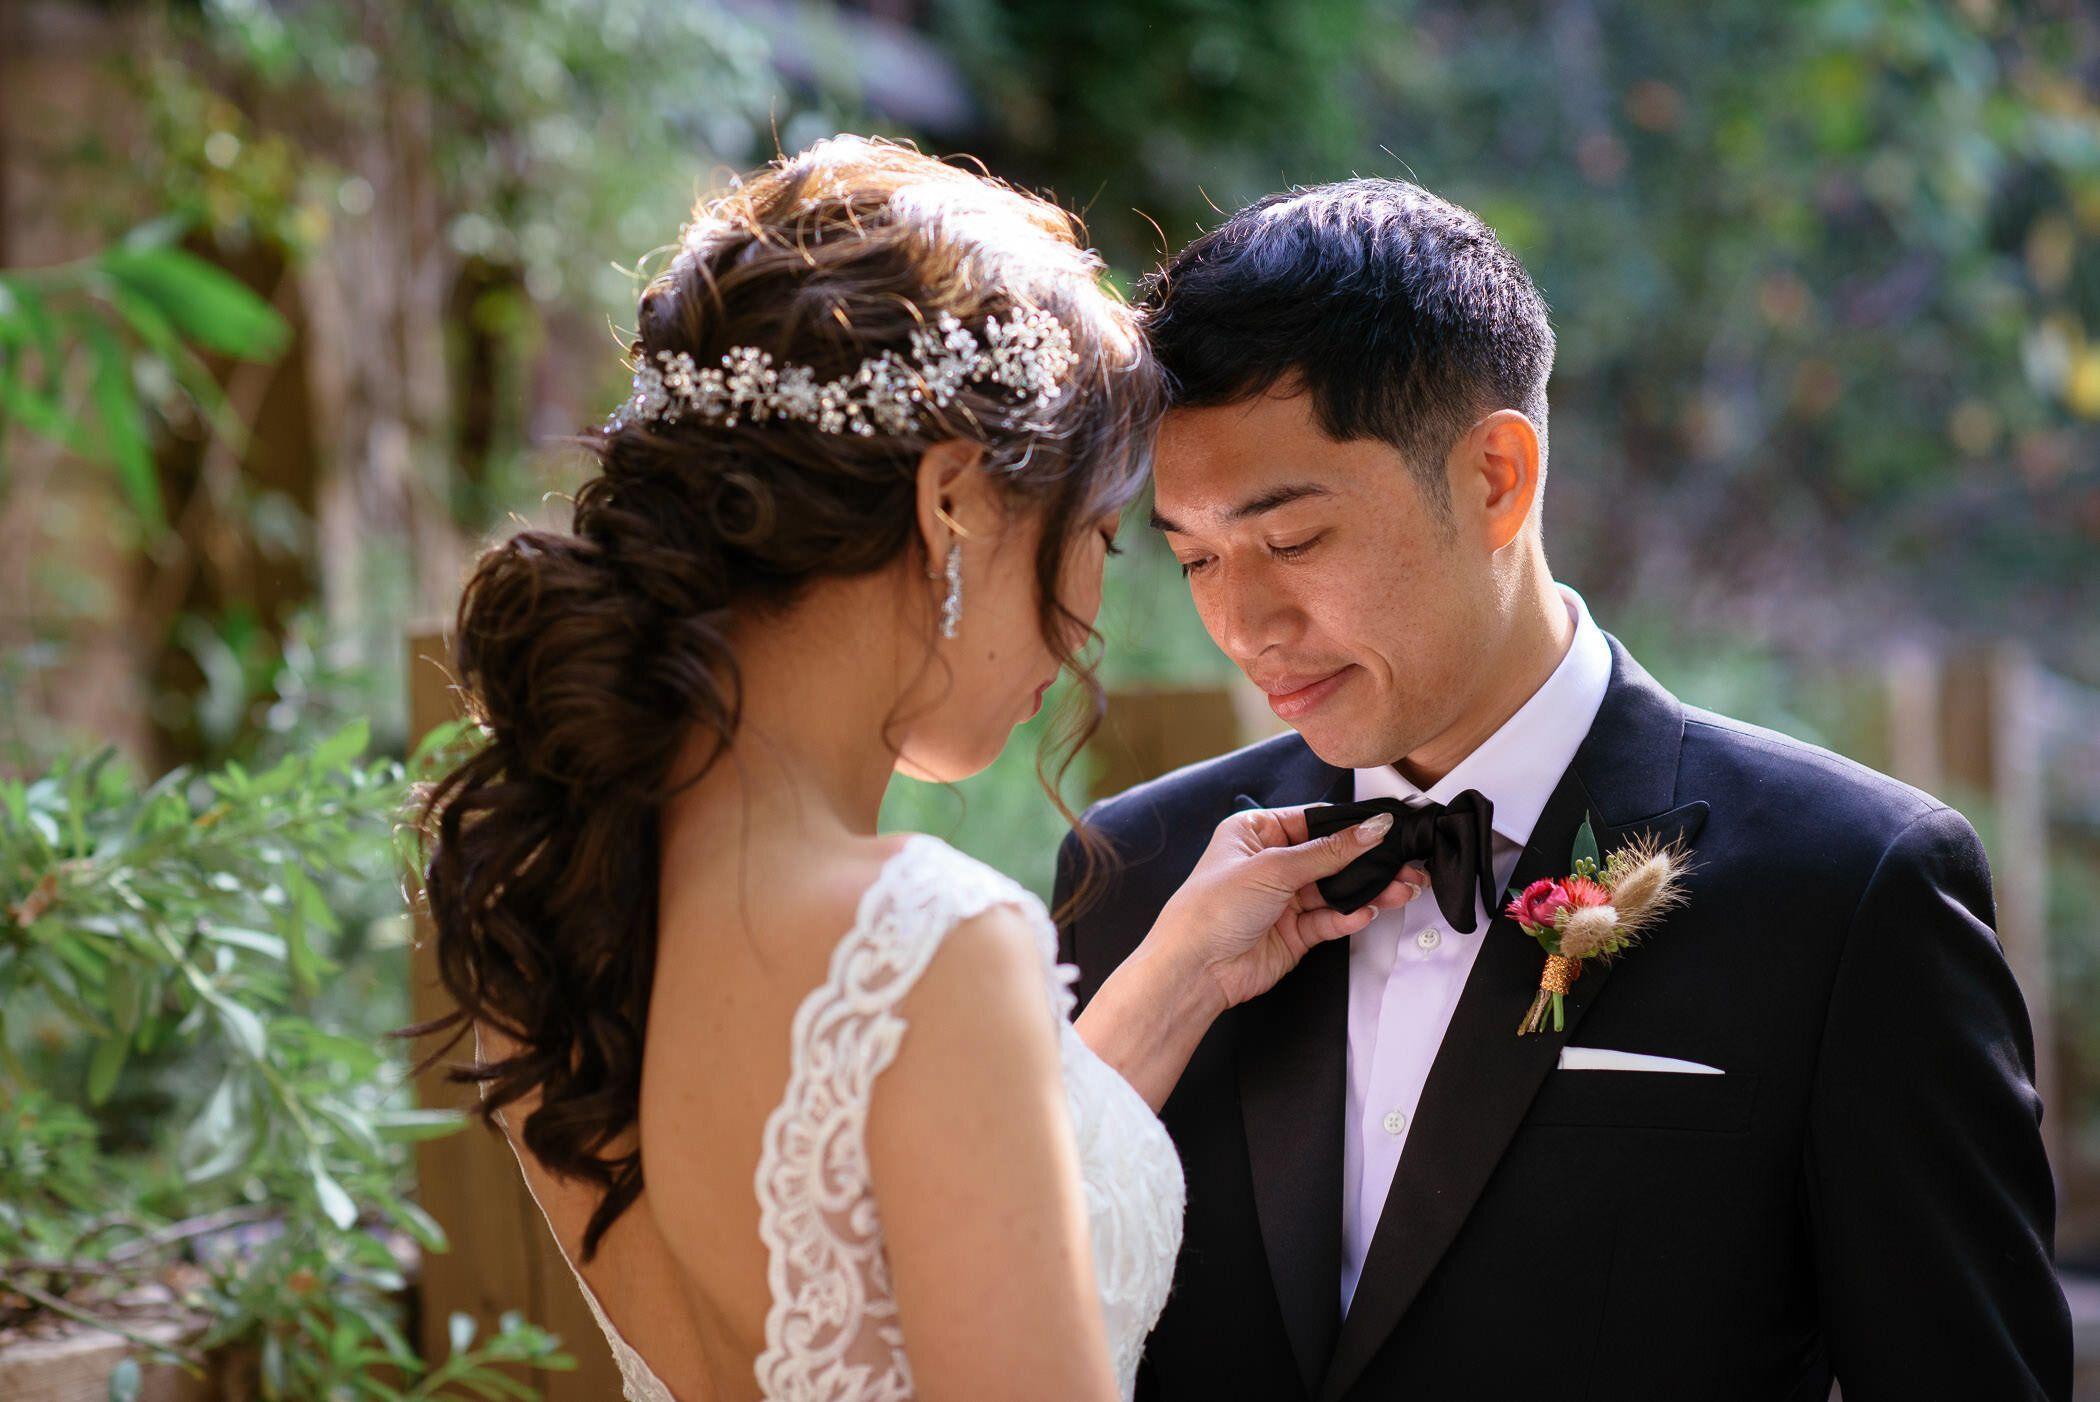 A Micro Wedding At The 1909 Feathered Arrow In 2020 Wedding Southern California Wedding Portraits California Wedding